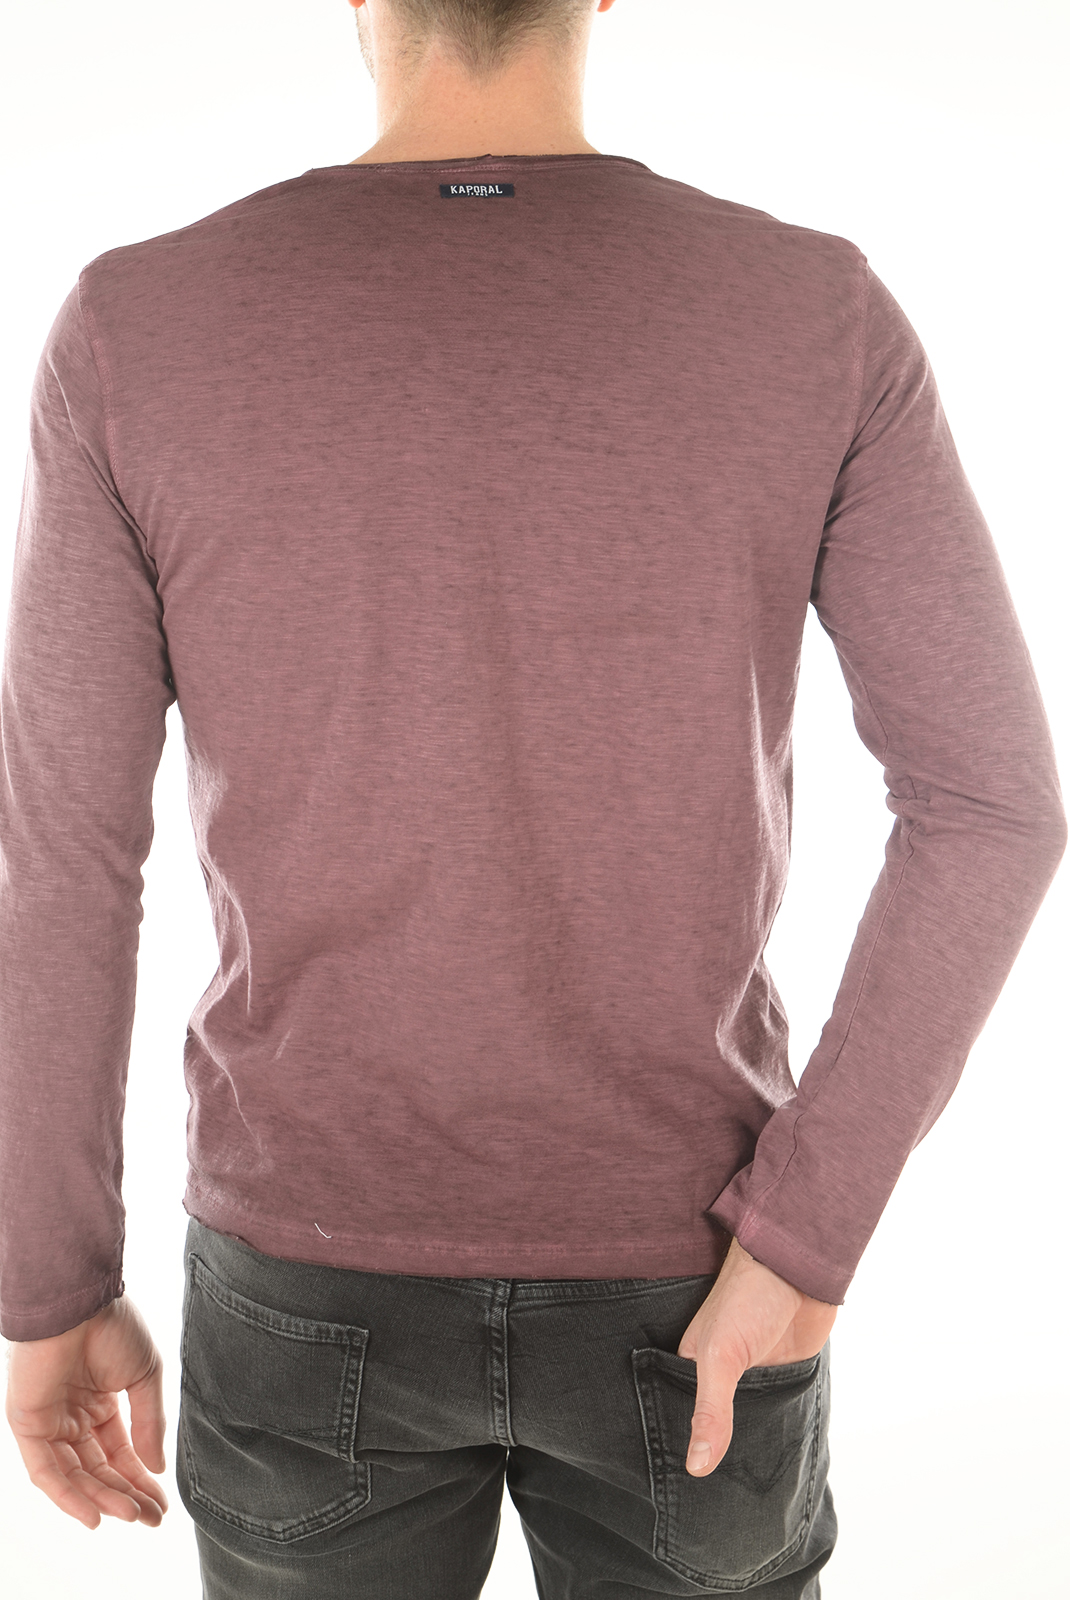 Tee-shirts  Kaporal TING GRAPE